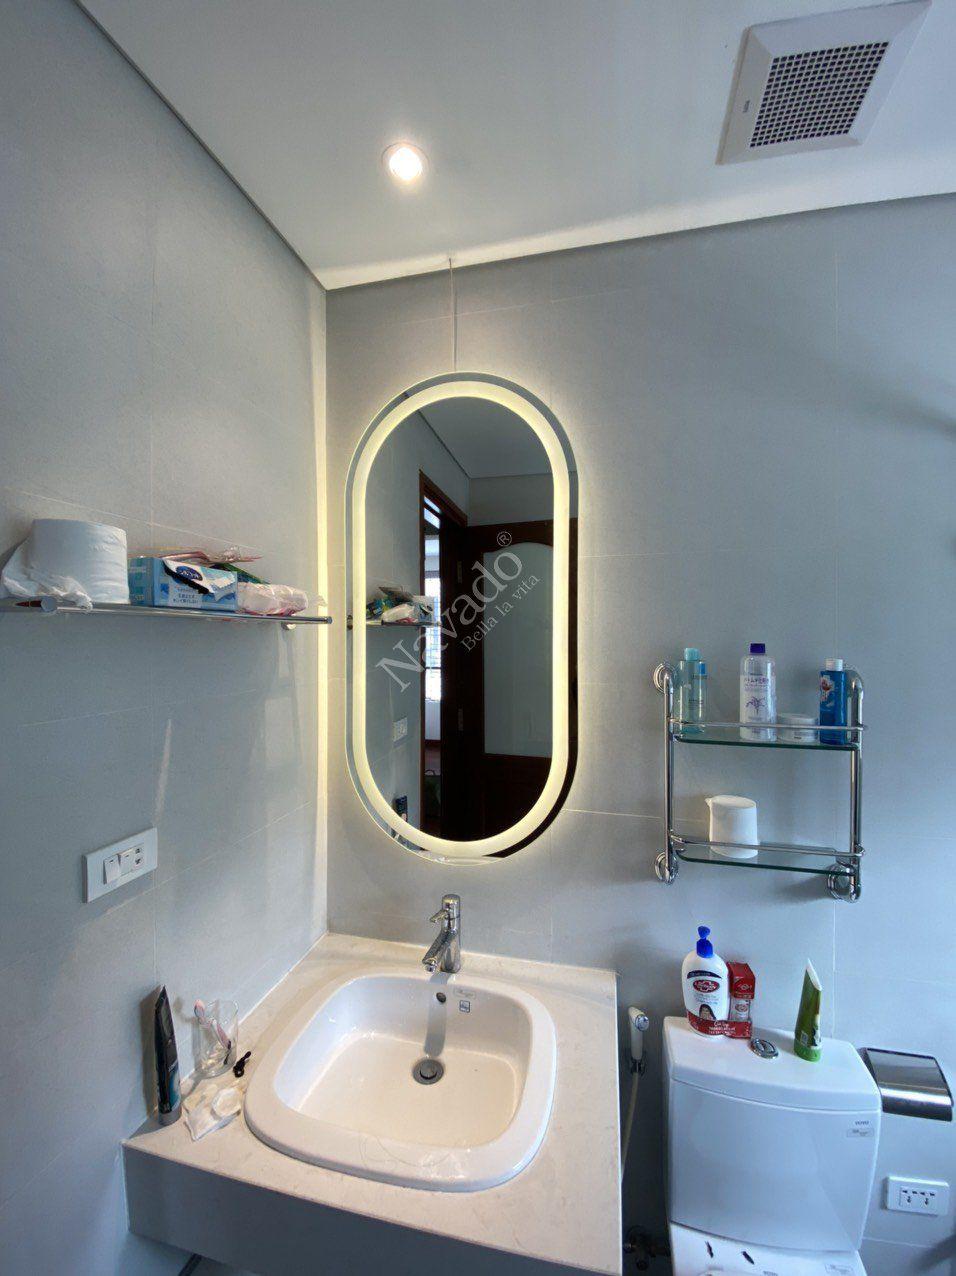 Pin On Art Navado Mirror Bathroom lights ideas png